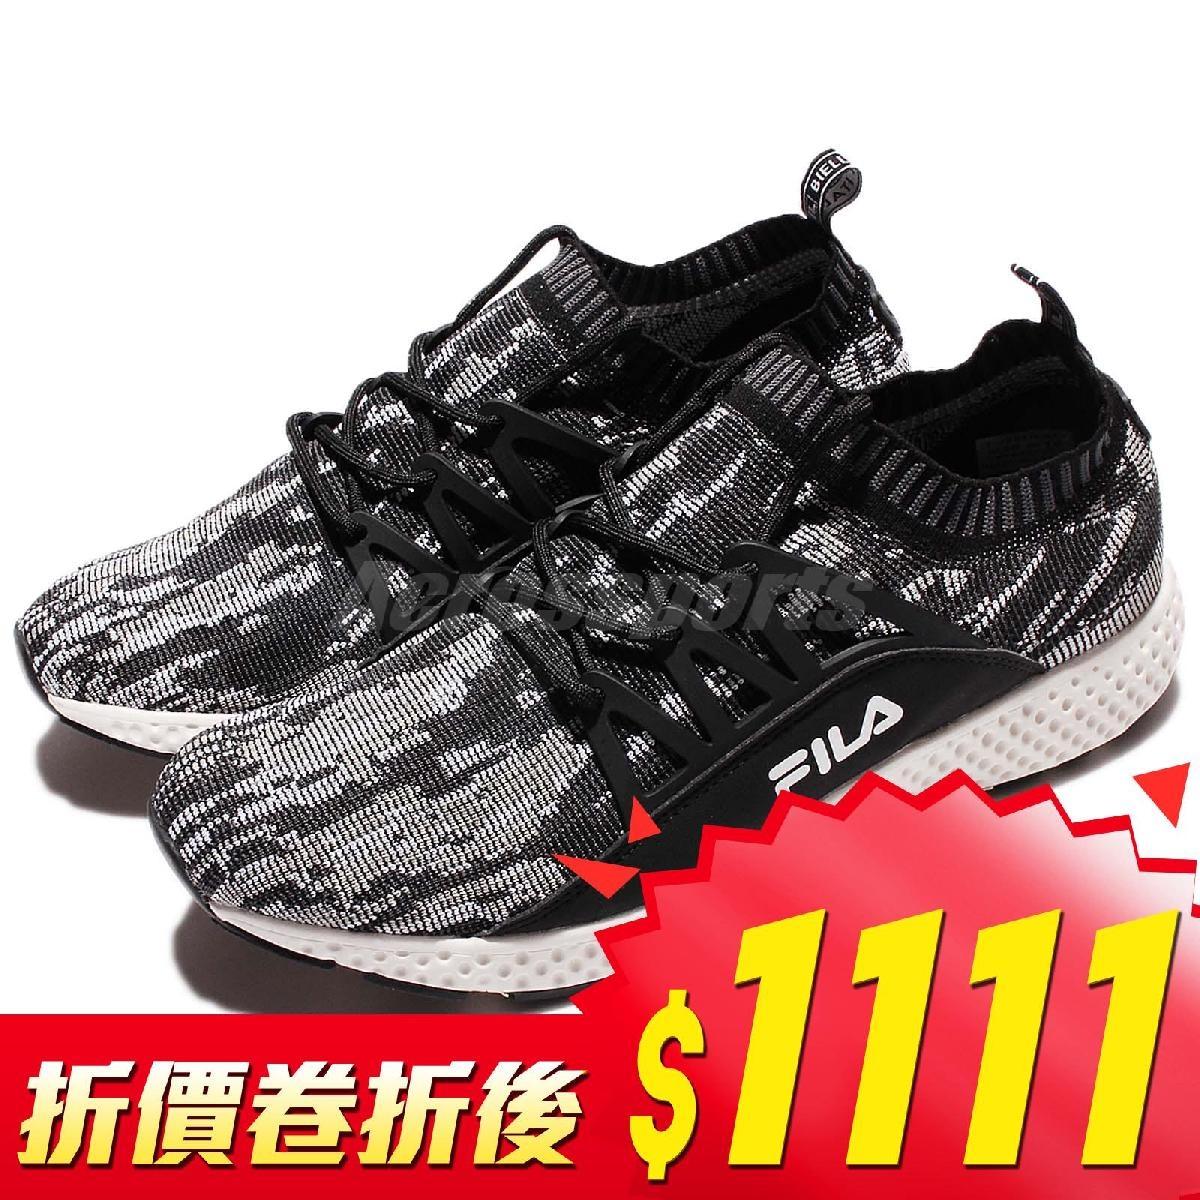 FILA 慢跑鞋 J307R 低筒 襪套式 黑 白 雪花 運動鞋 編織鞋面 男鞋【PUMP306】 1J307R401